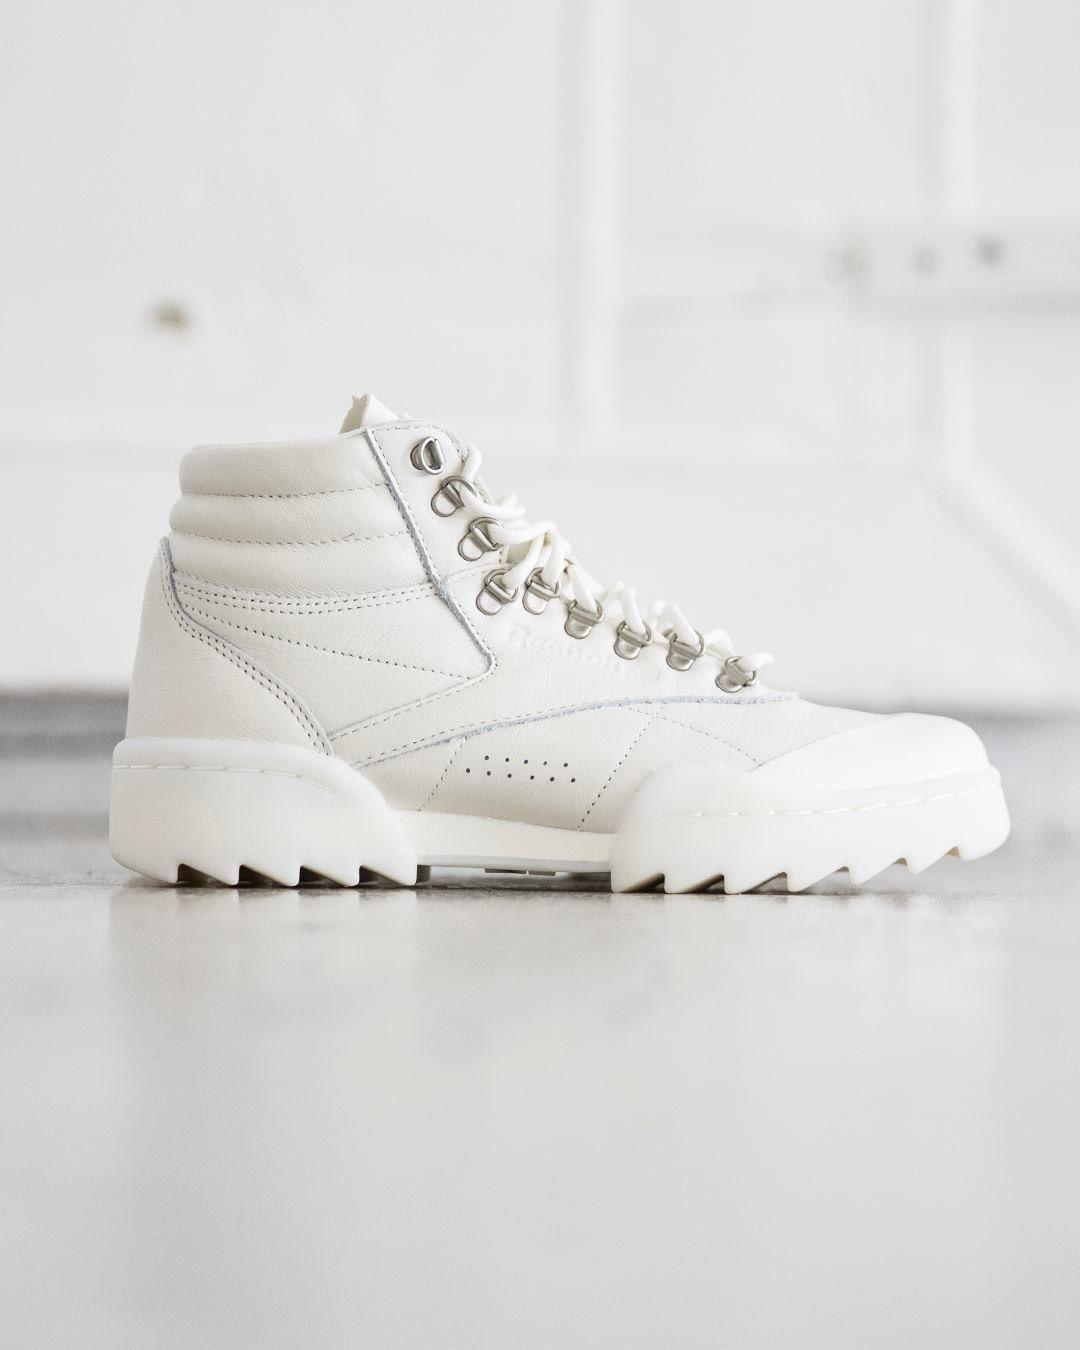 Gigi Hadid x Reebok Freestyle Hi Nova Ripple Gigi Hadid Shoes 70b856144fae4